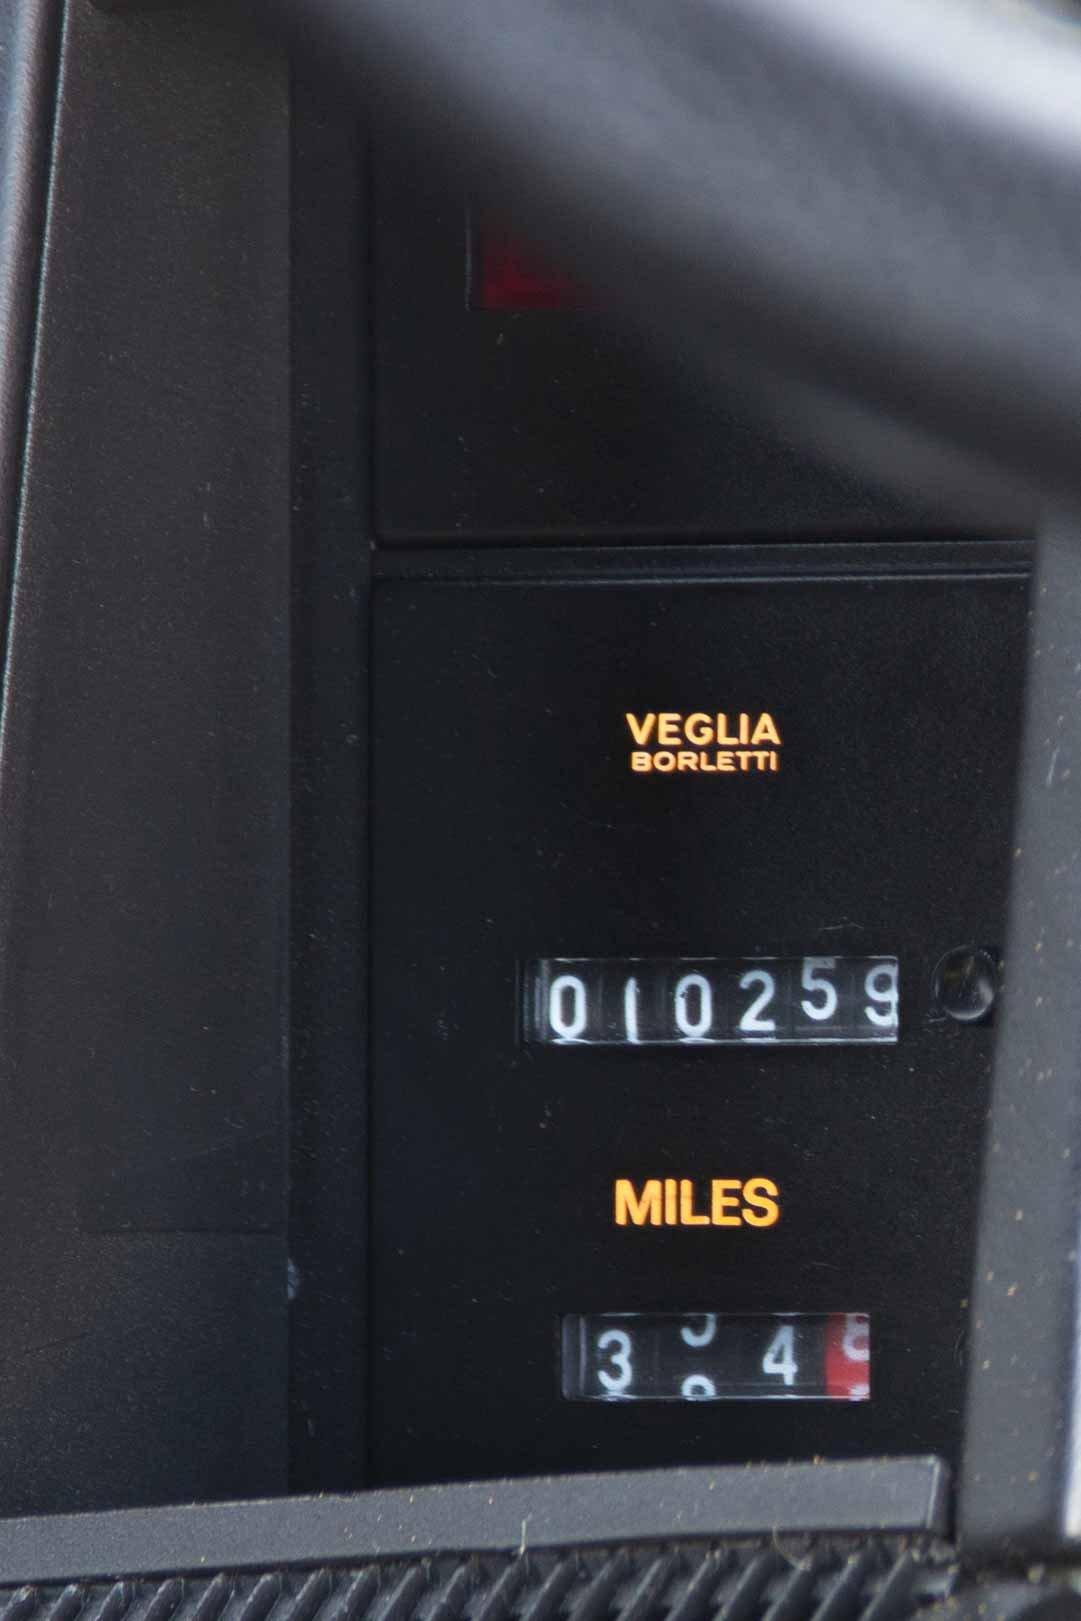 1989 Ferrari Testarossa - 1 owner, 10k miles, luggage For Sale (picture 5 of 6)